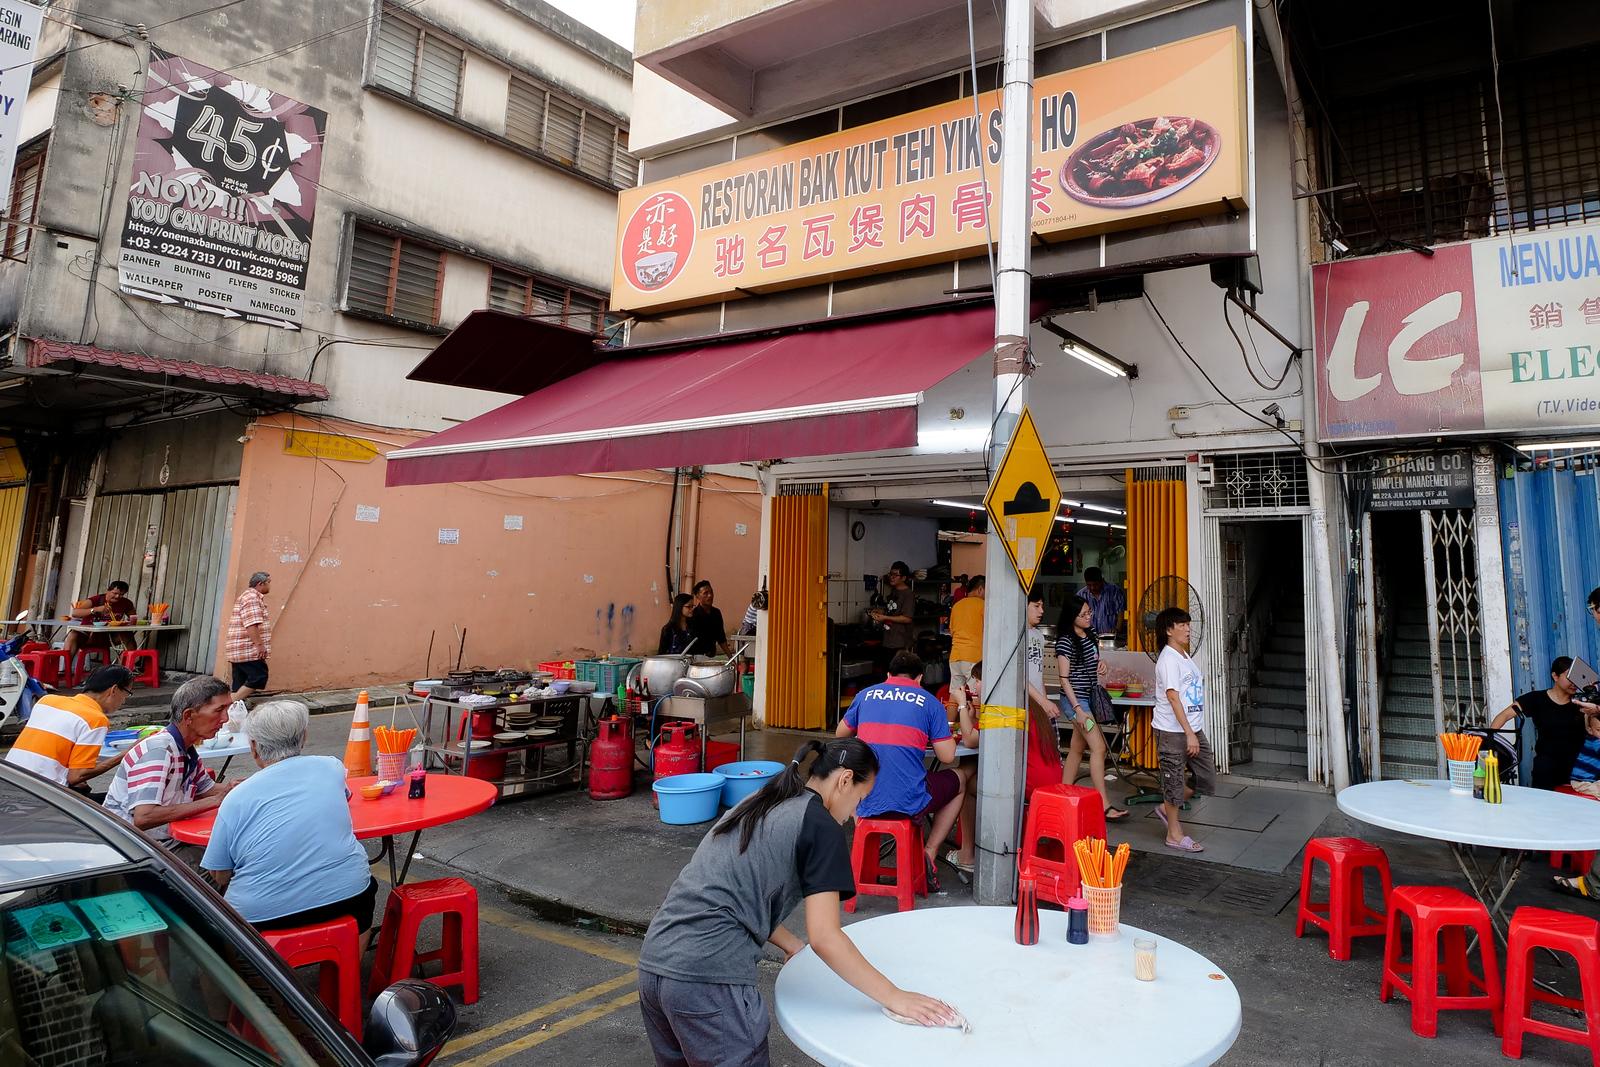 Wonderful examples of Hokkien chinese-Malay cuisine at Bak Kut Teh Yik See Ho